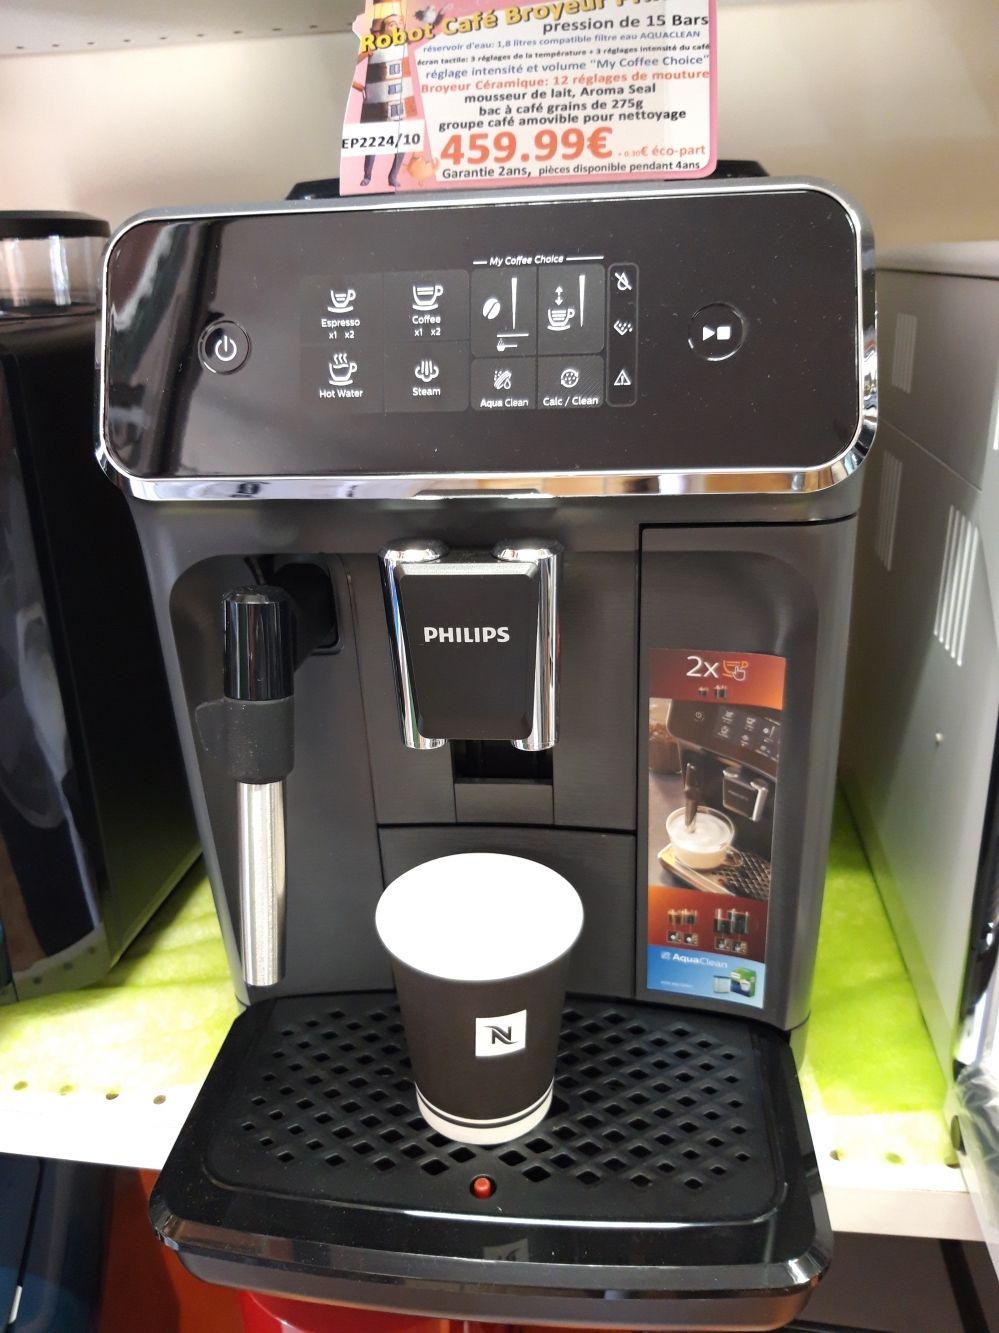 ROBOT CAFE SAECO